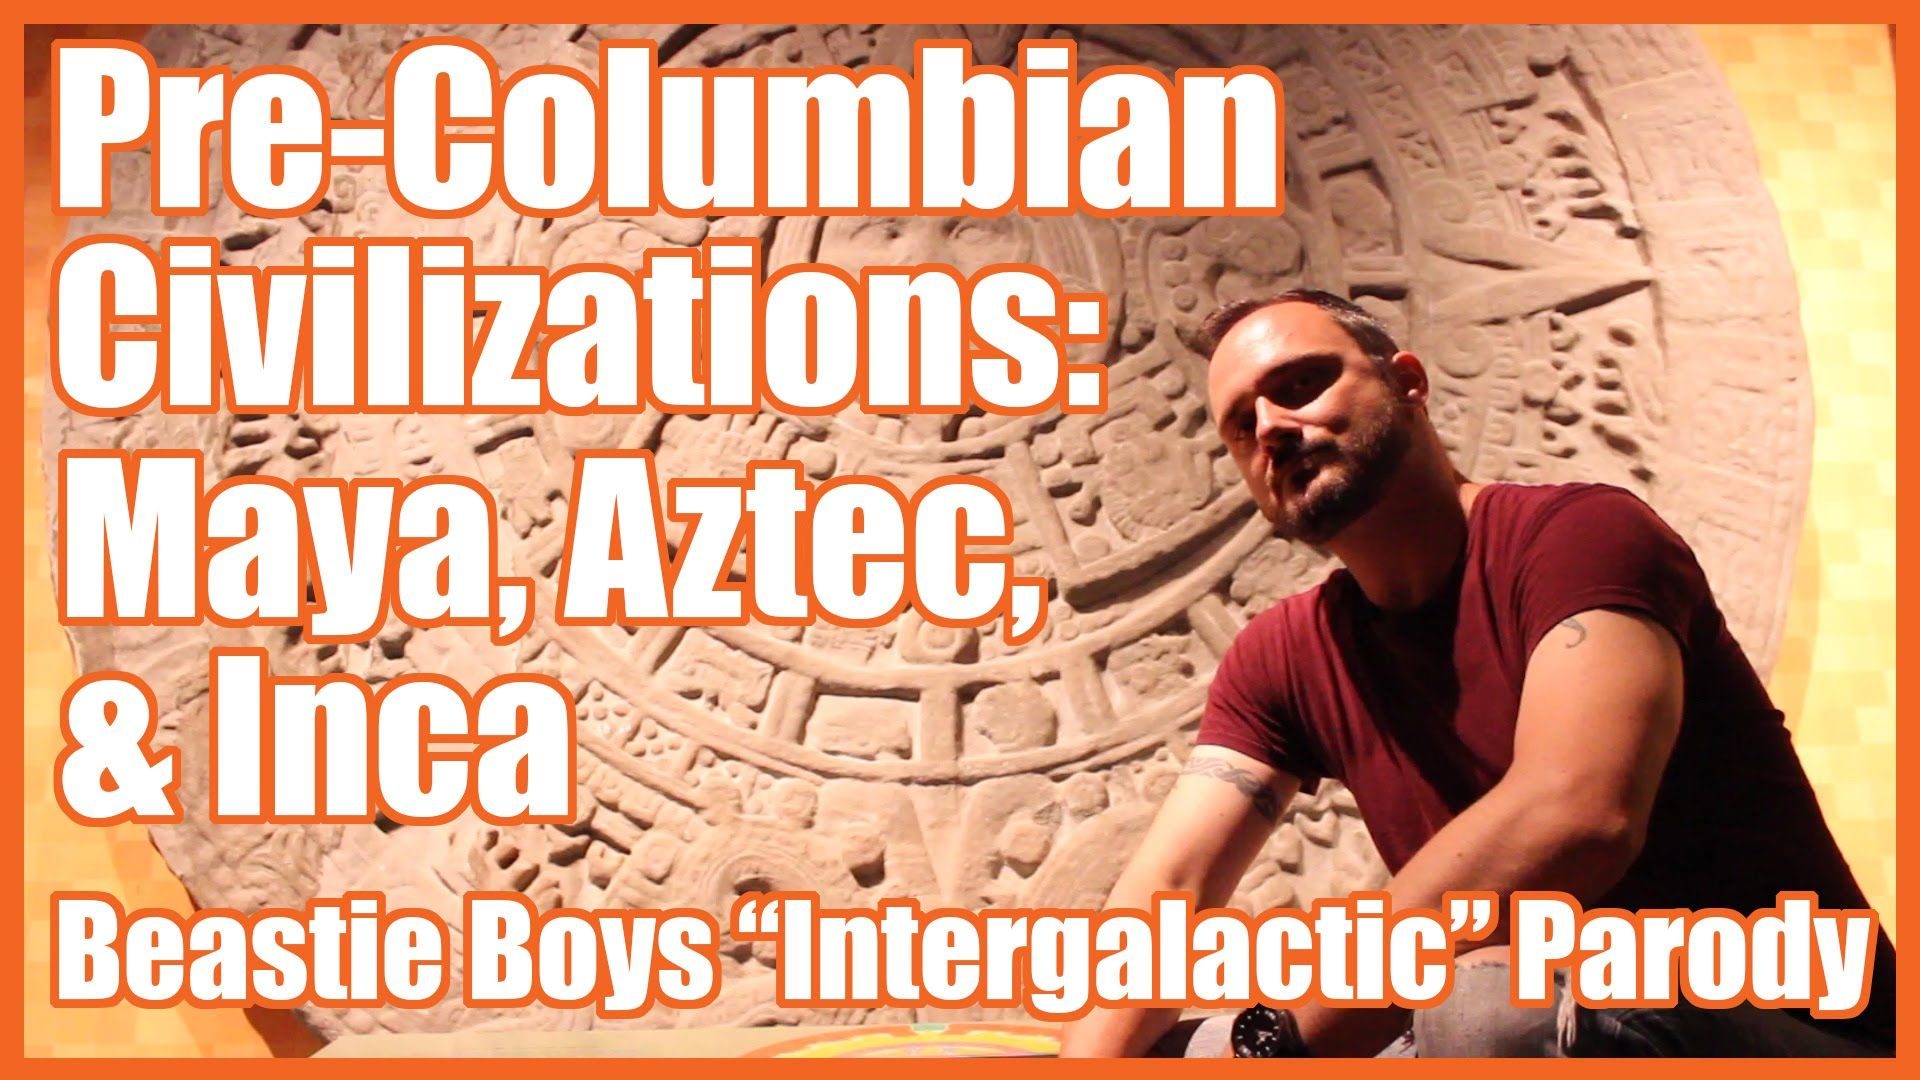 Maya Aztec Amp Inca Beastie Boys Intergalactic Parody